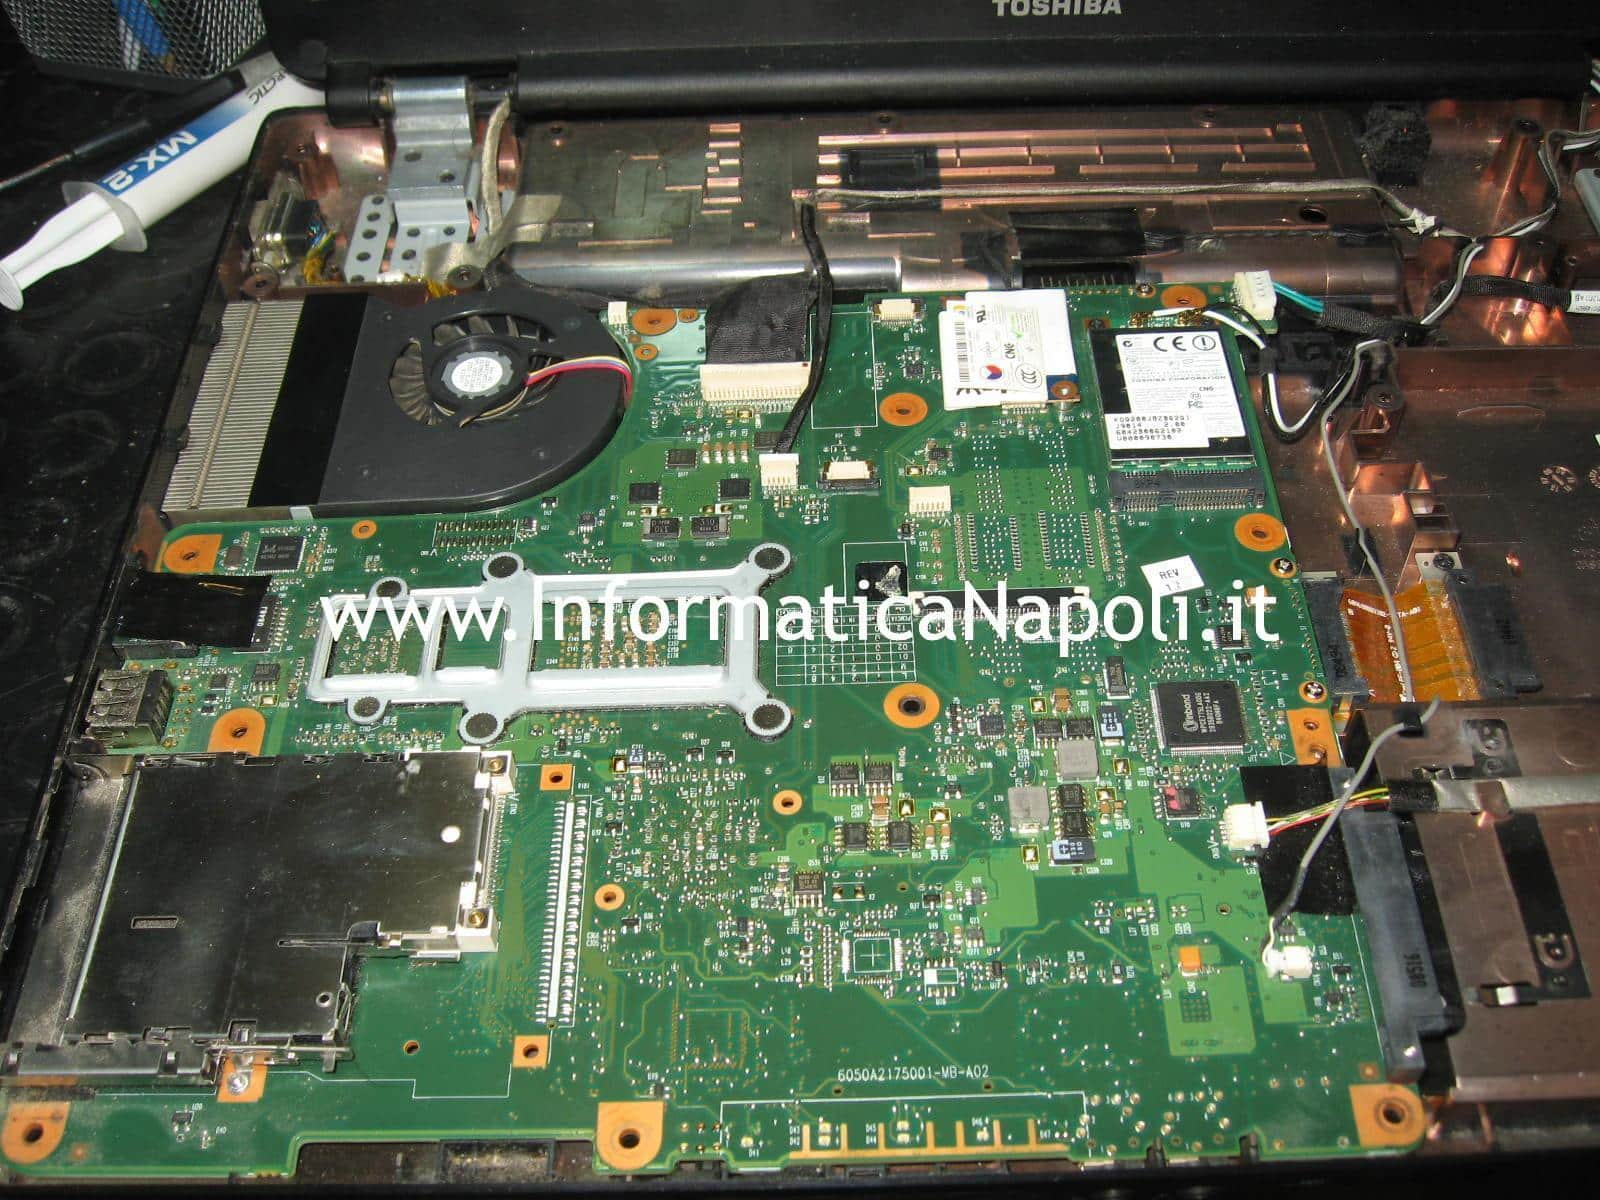 scheda madre Toshiba Satellite L350D - 12G PSLE8E